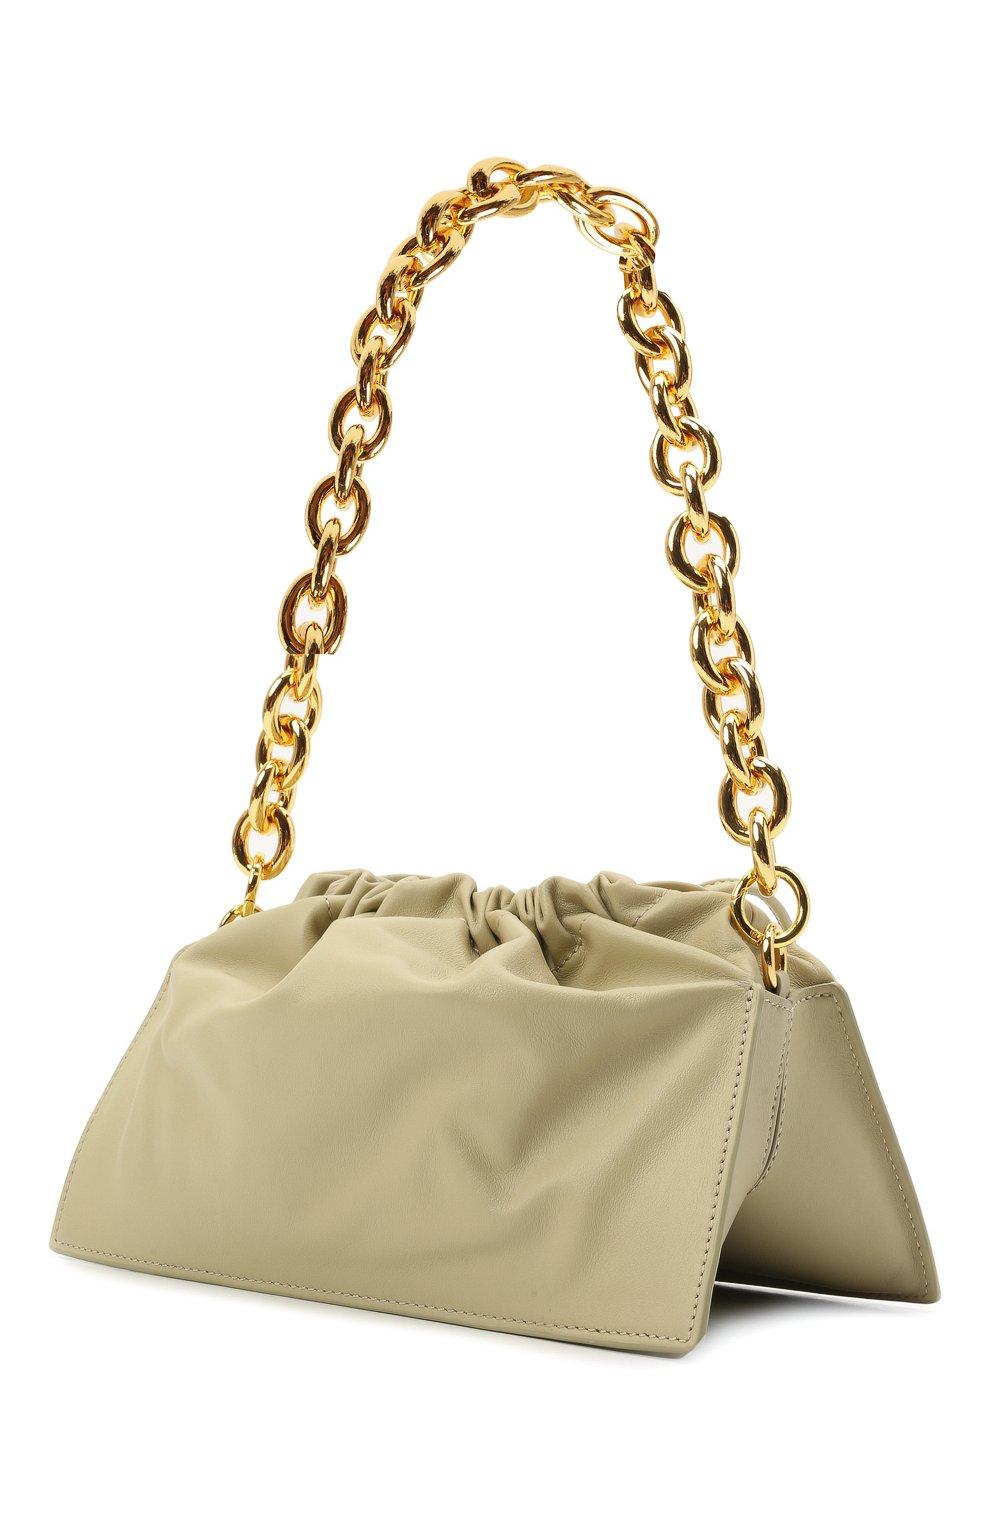 Женская сумка bom YUZEFI светло-зеленого цвета, арт. YUZIC0-HB-B0-13 | Фото 3 (Сумки-технические: Сумки top-handle; Материал: Натуральная кожа; Ремень/цепочка: На ремешке; Размер: small)